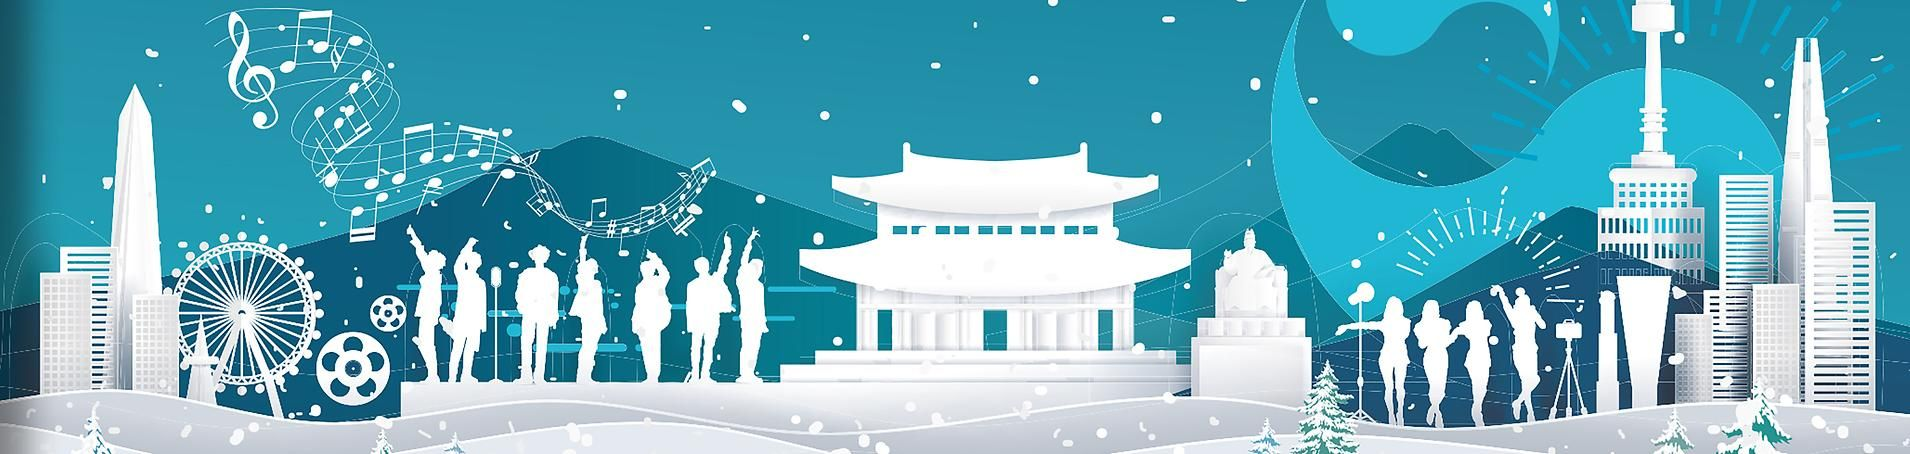 WISE - Зимняя школа в Университете Сонгюнгван, Республика Корея